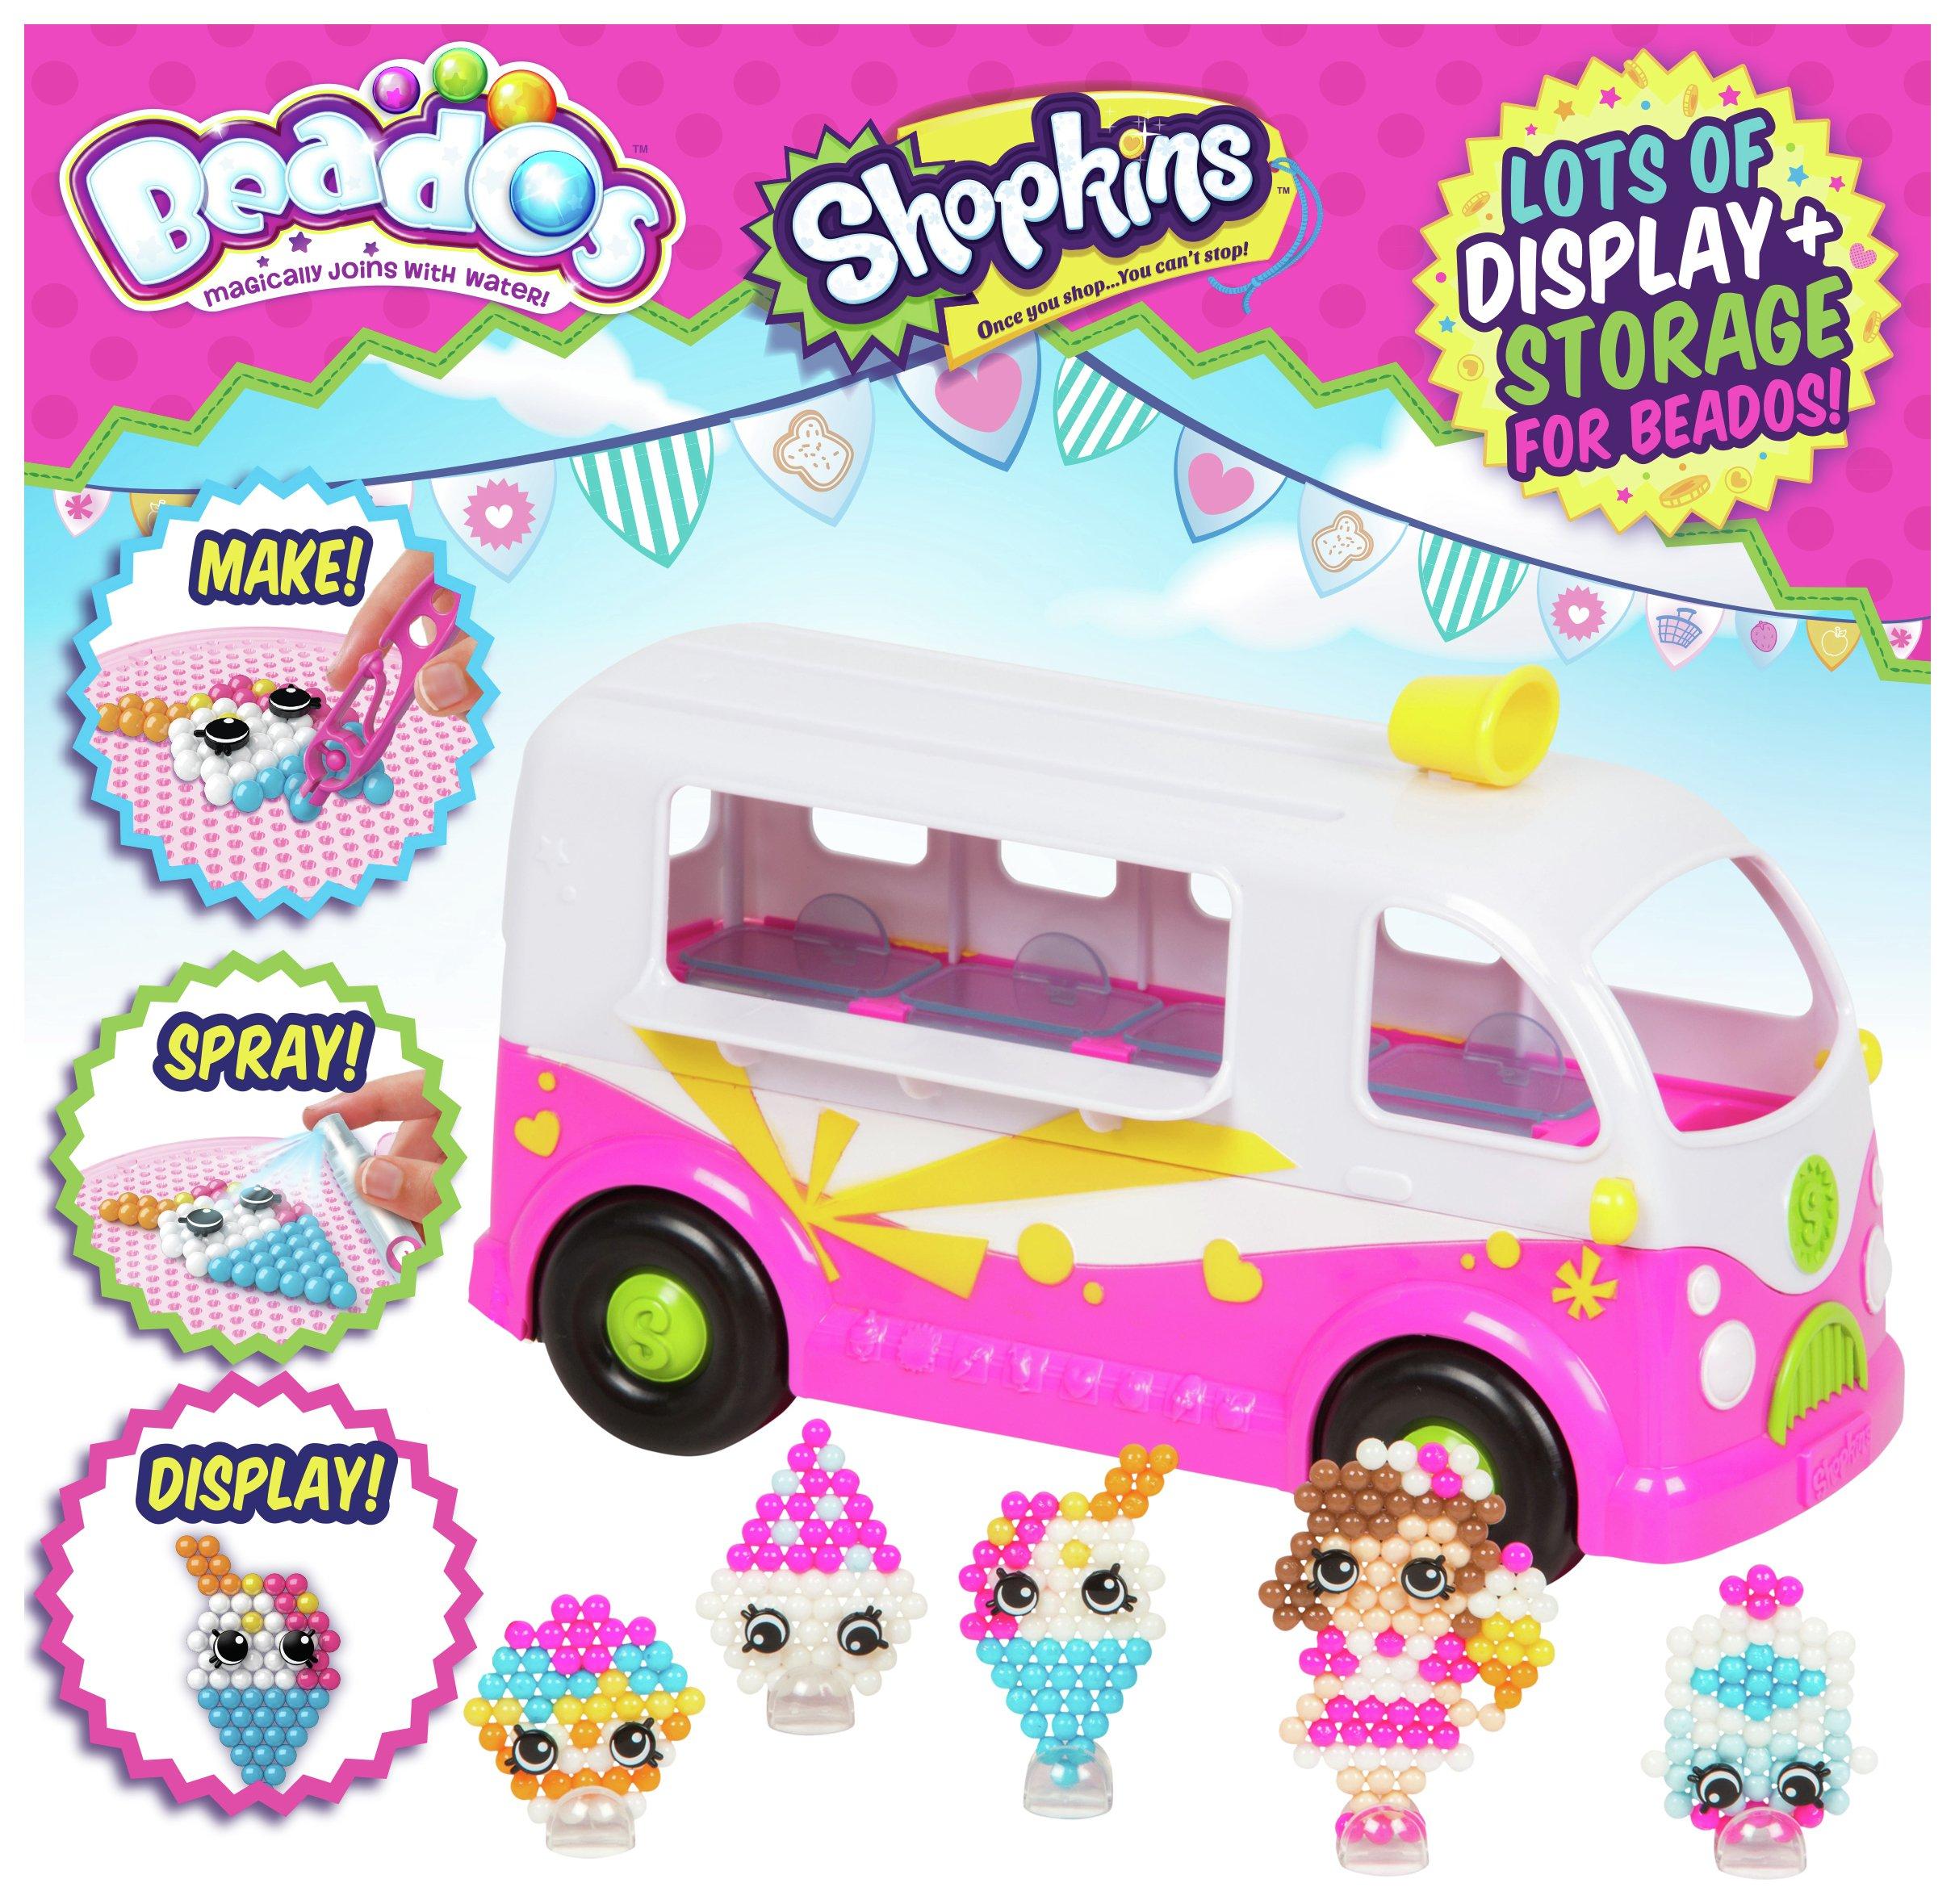 Image of Beados Shopkins Ice Cream Van